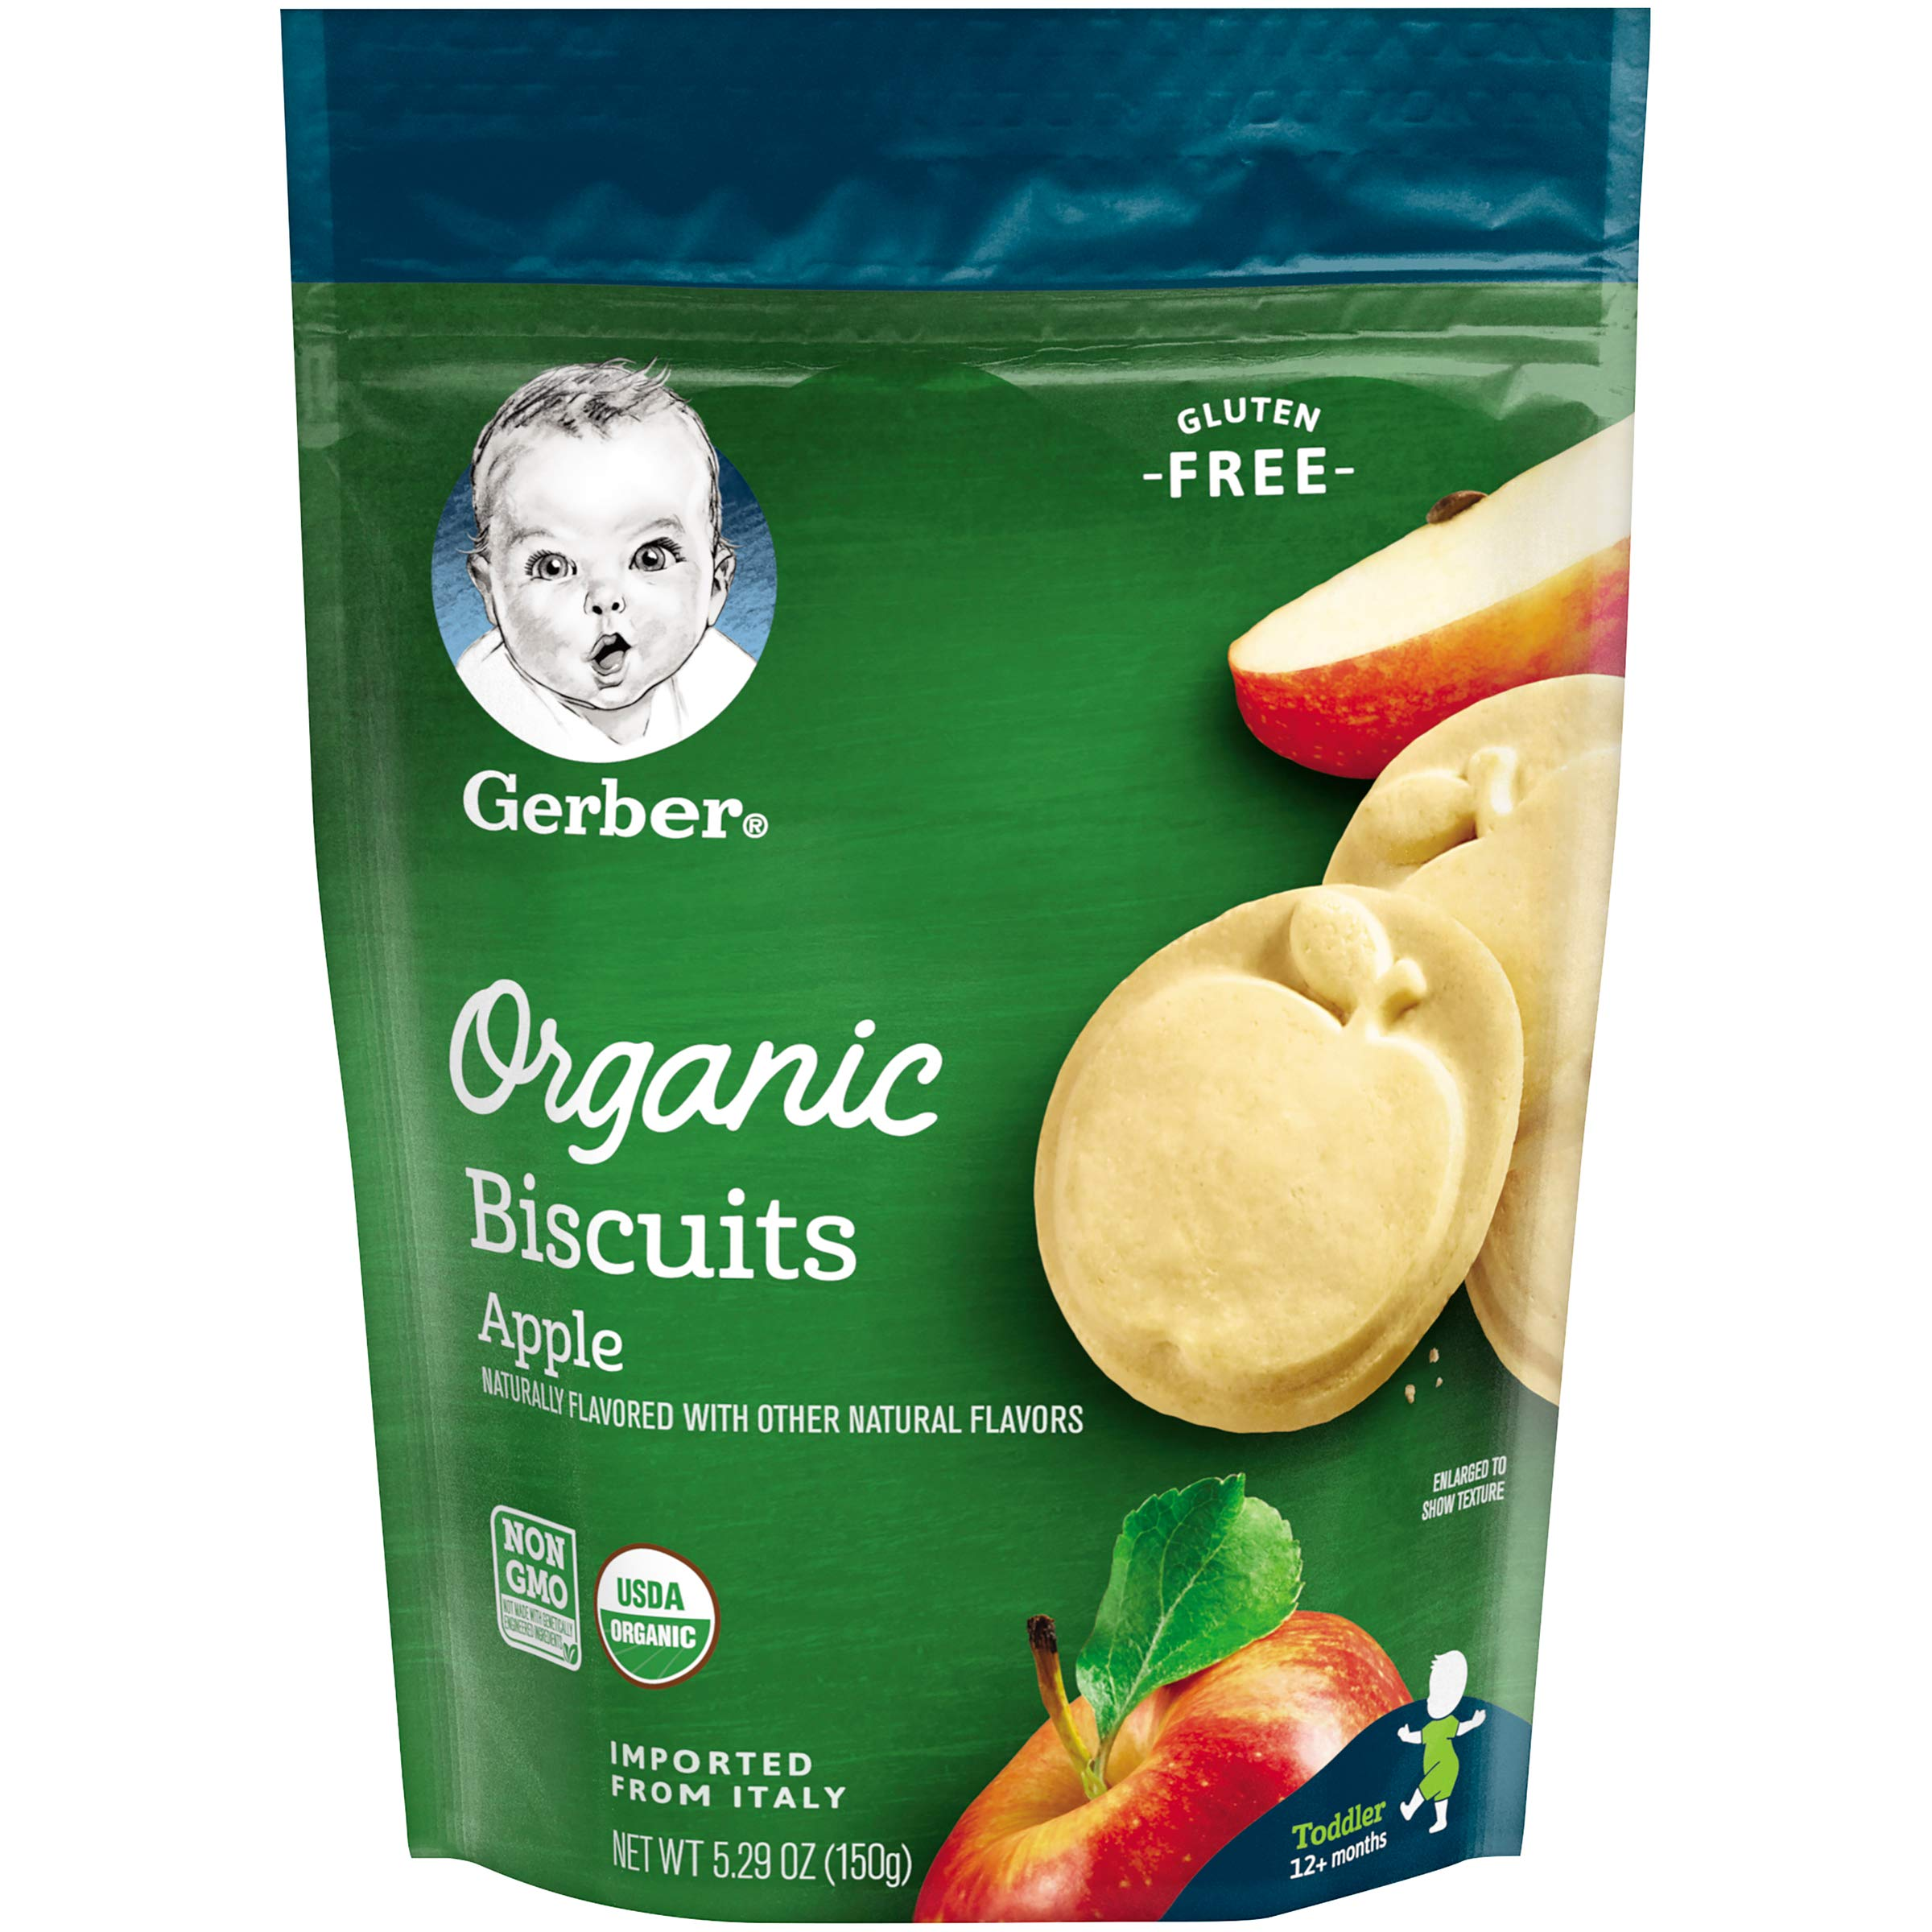 Gerber Graduates Organic Gluten Free Biscuits, Apple, 5.29 oz by Gerber